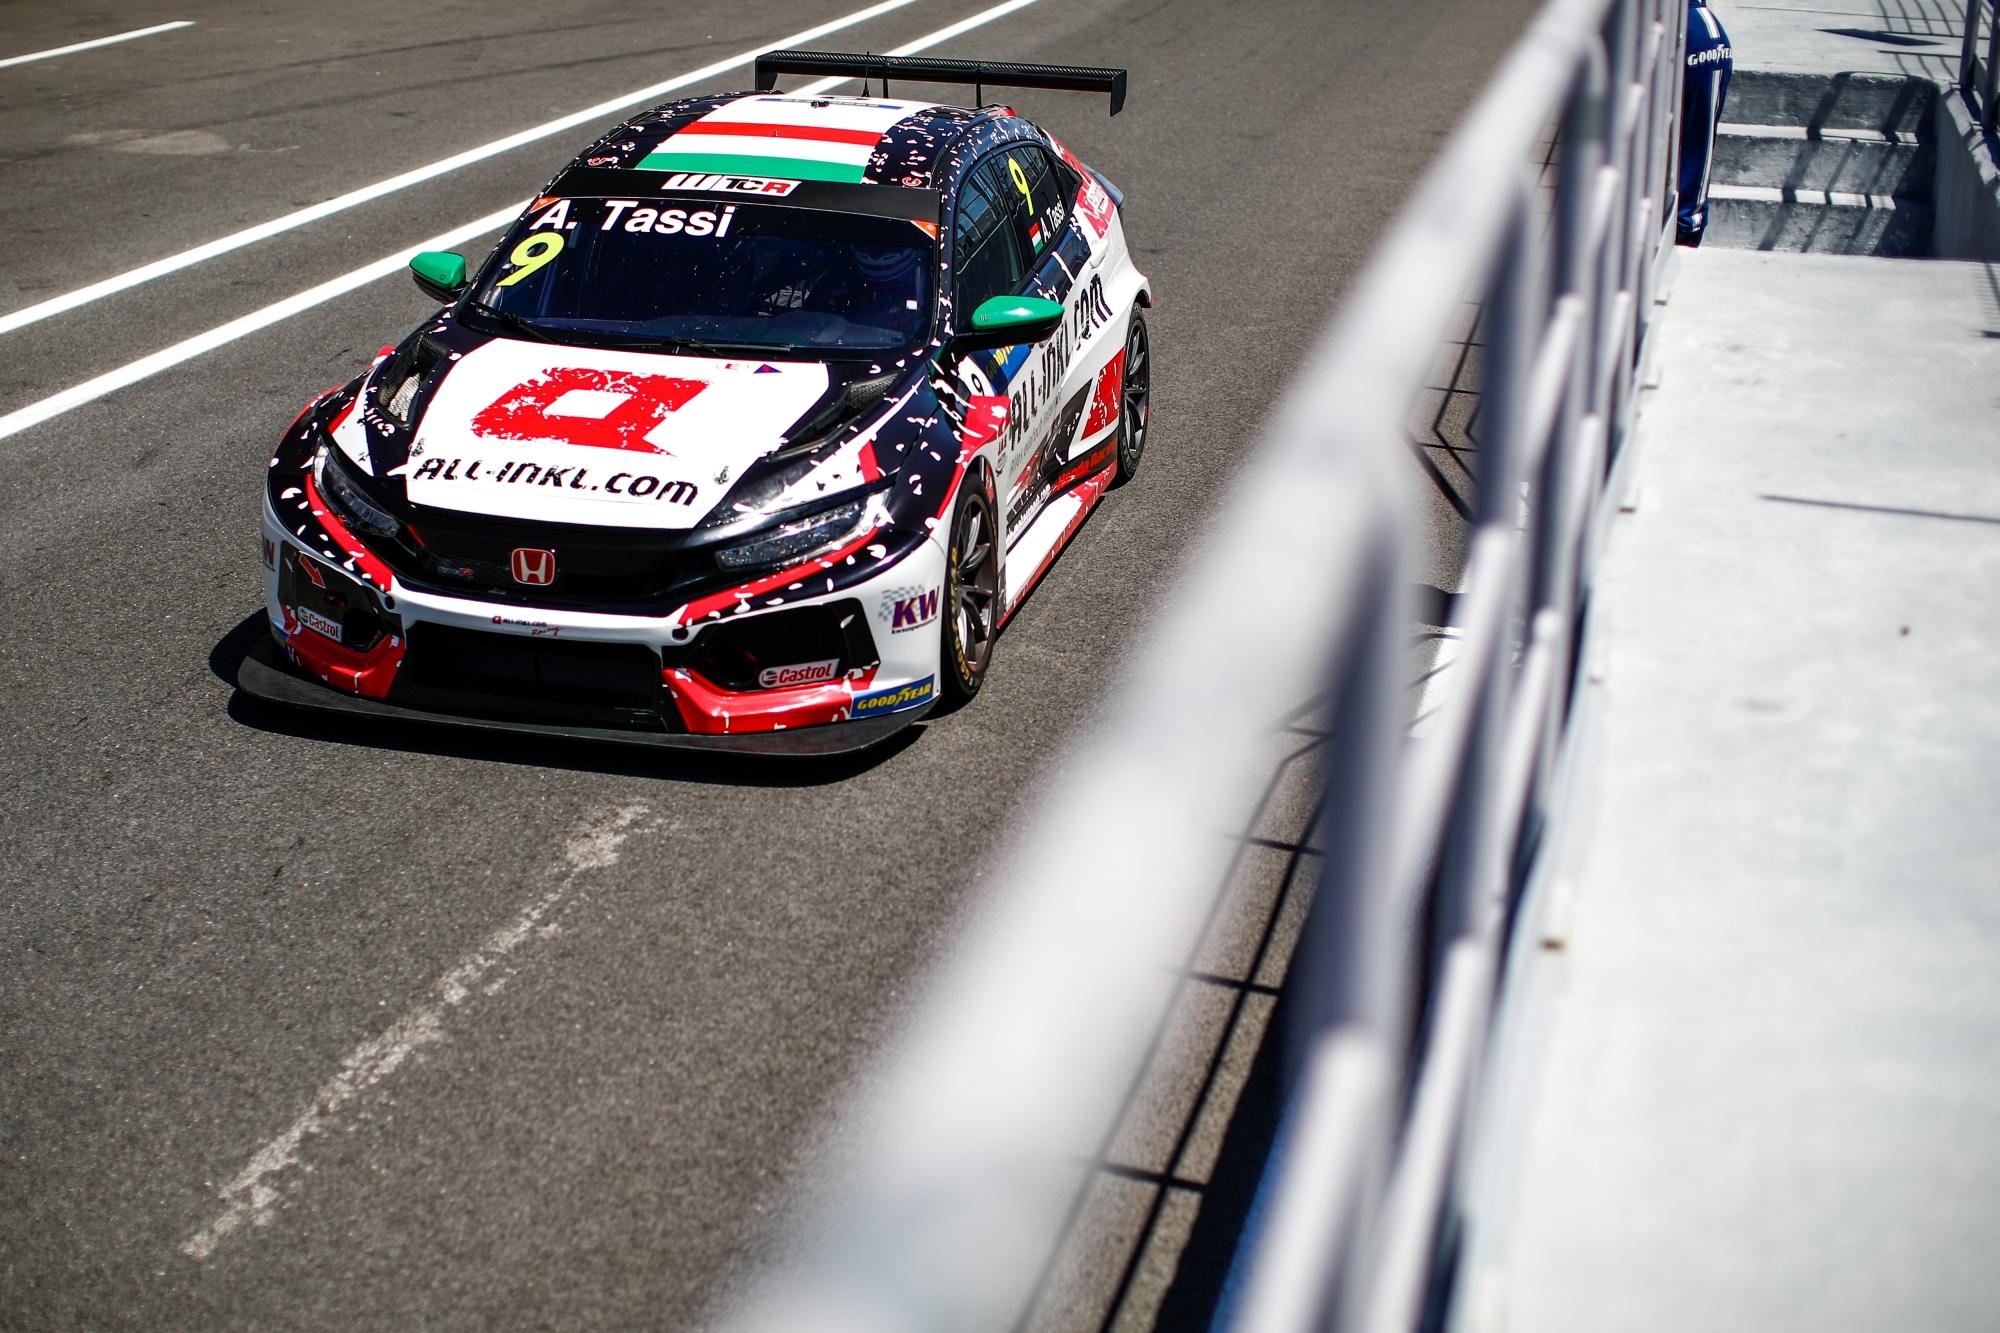 WTCR: Tarolt a Honda, Tassi a legjobb magyar